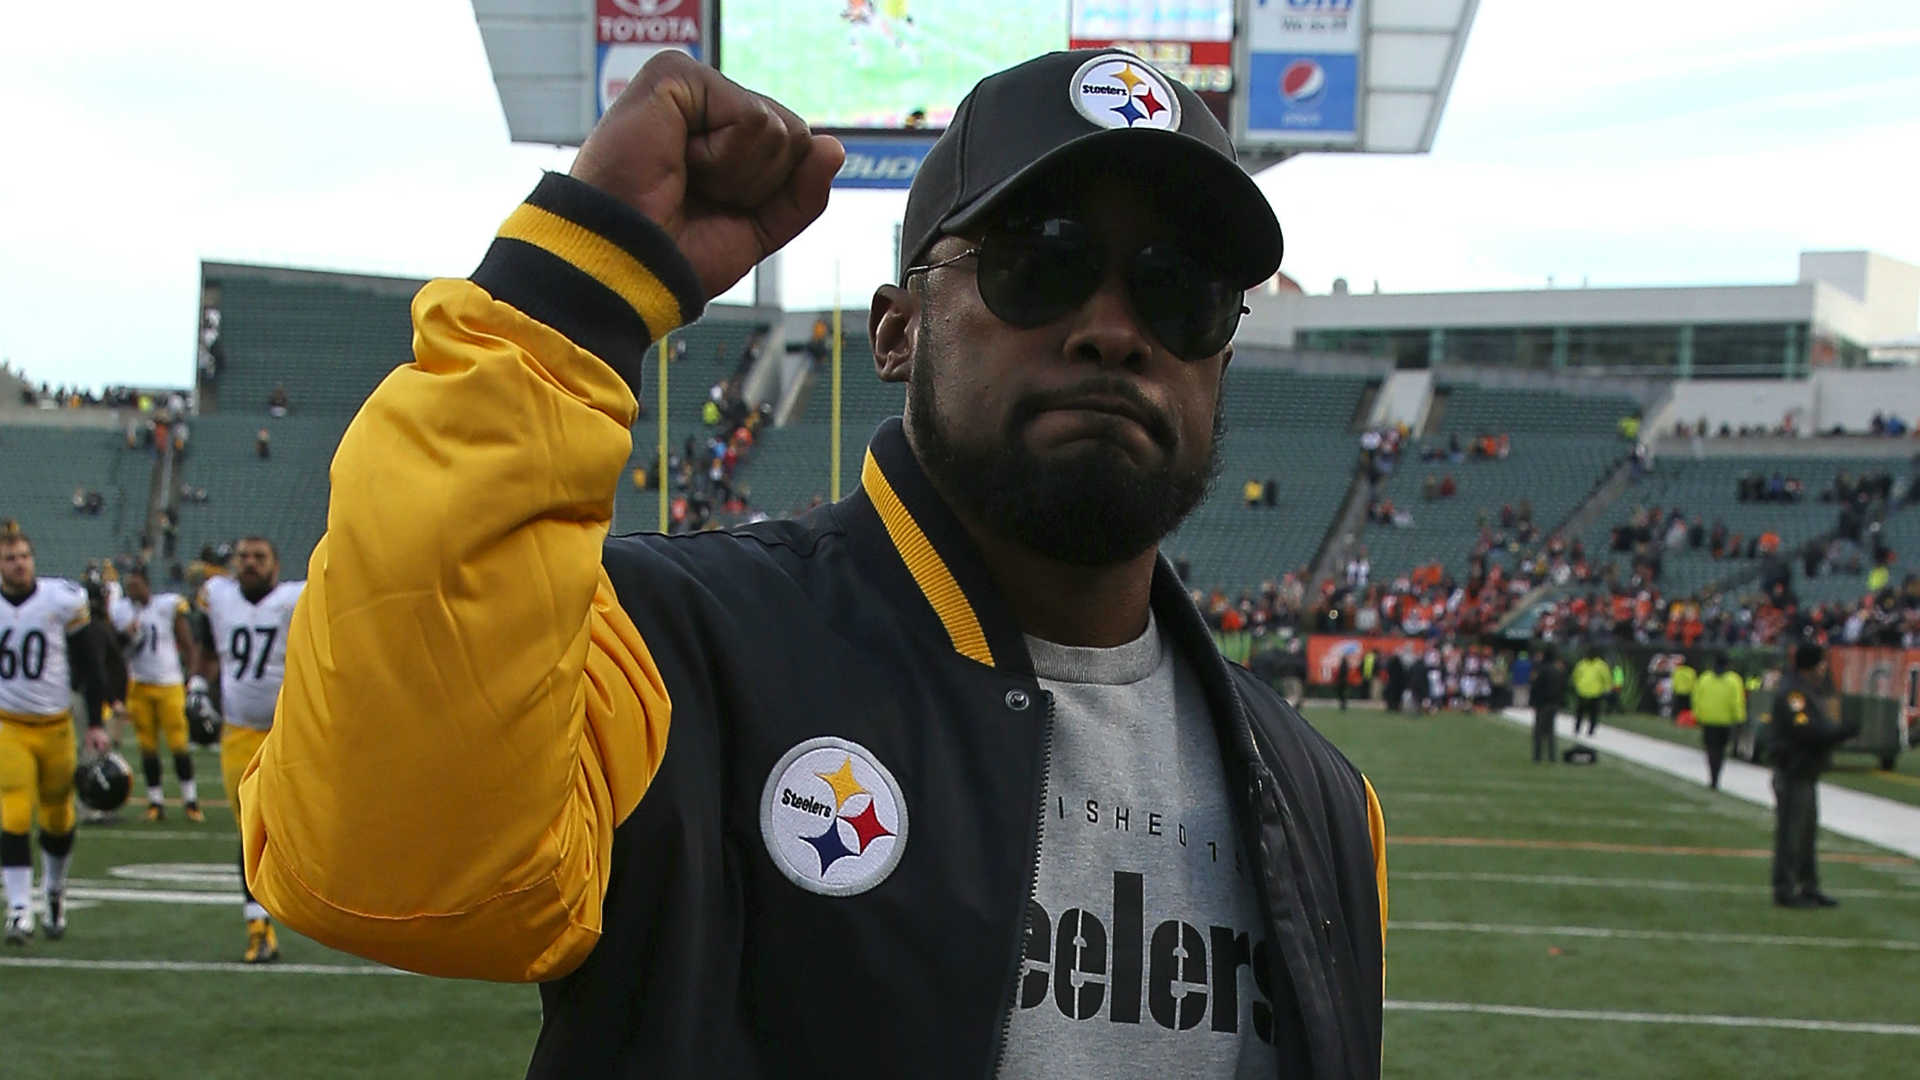 Steelers extend head coach Mike Tomlin through 2020